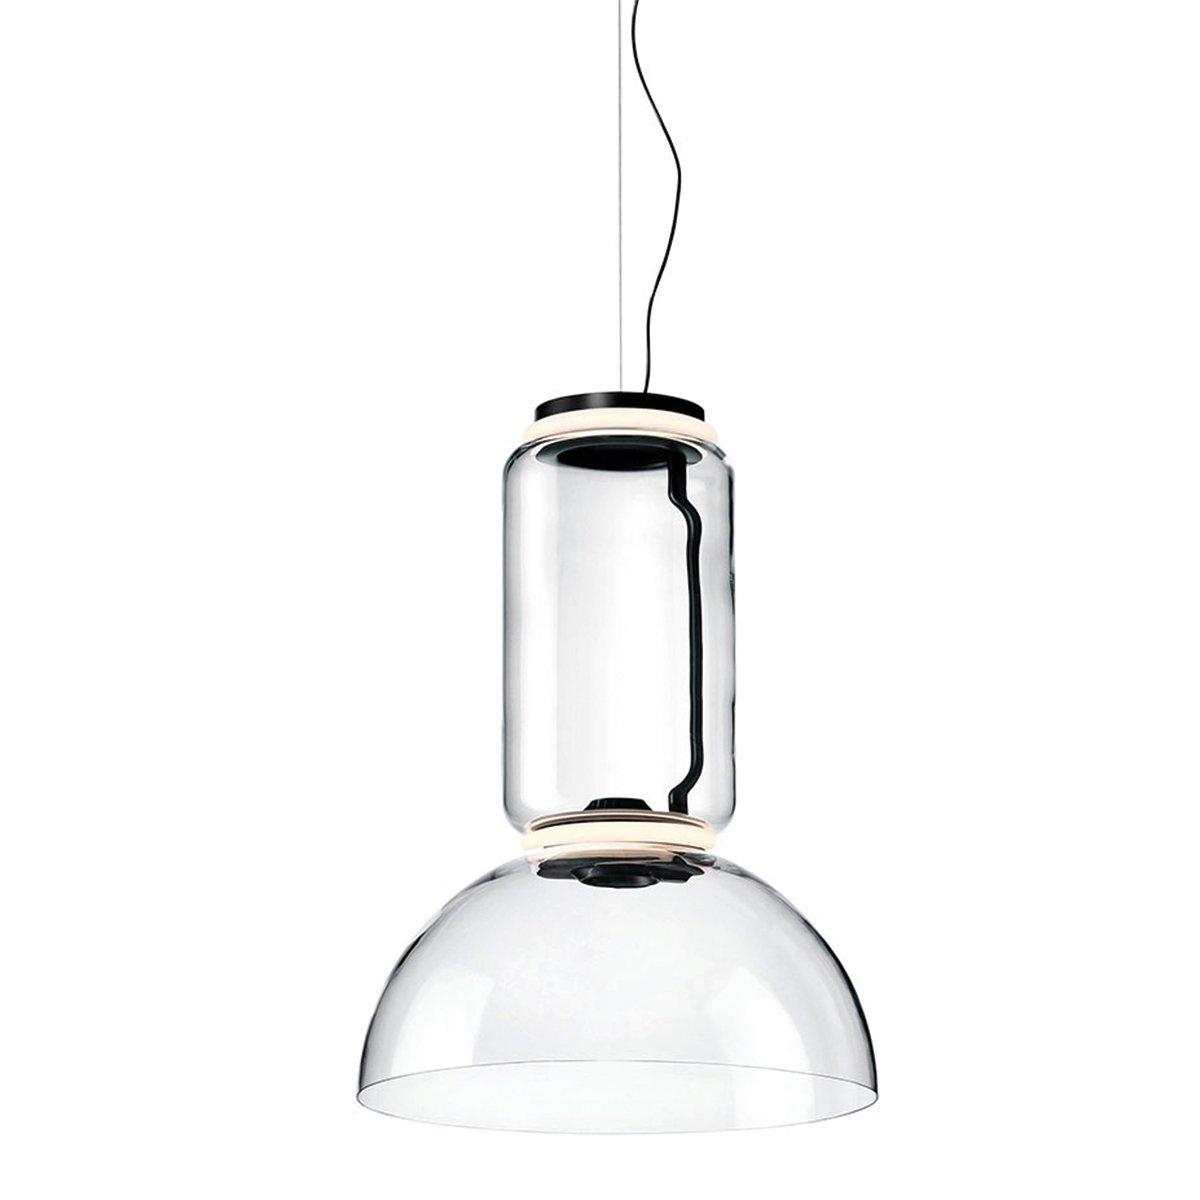 FLOS Noctambule Hanglamp - 1 Low Cylinder & Bowl